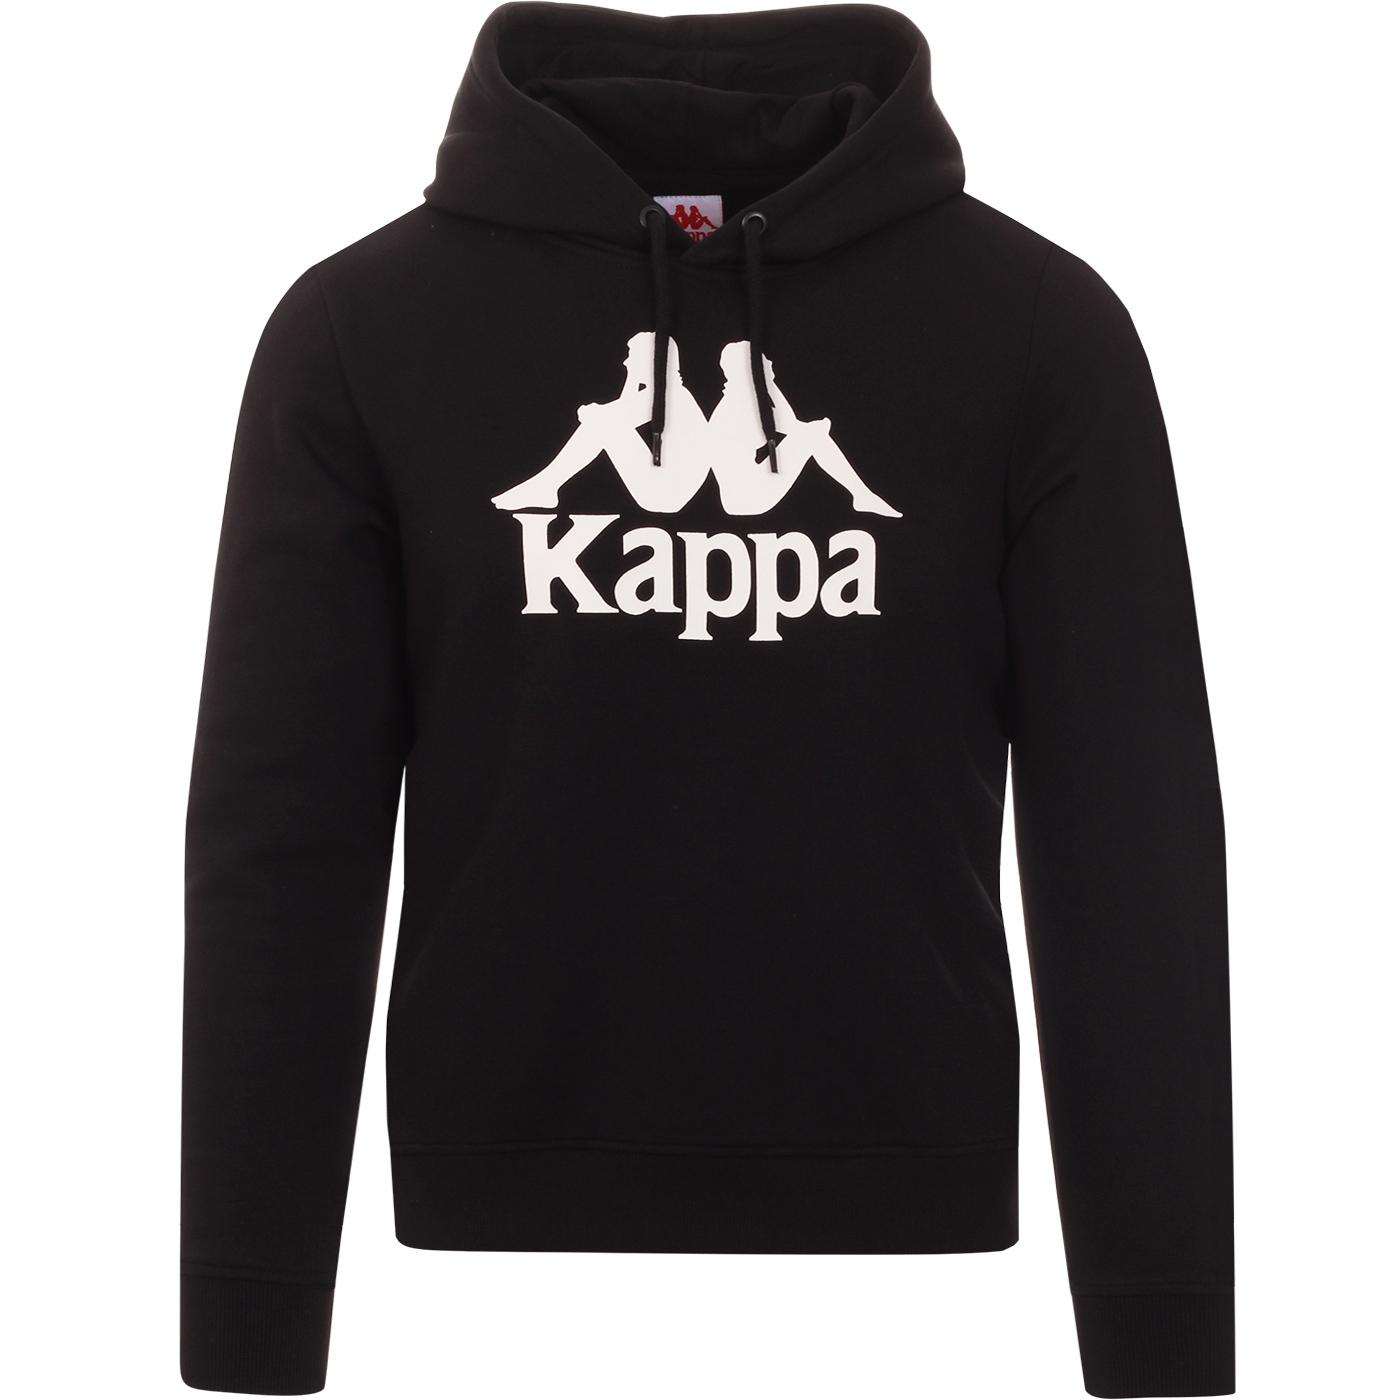 Esmio KAPPA Men's Eighties Retro Logo Hoodie BW